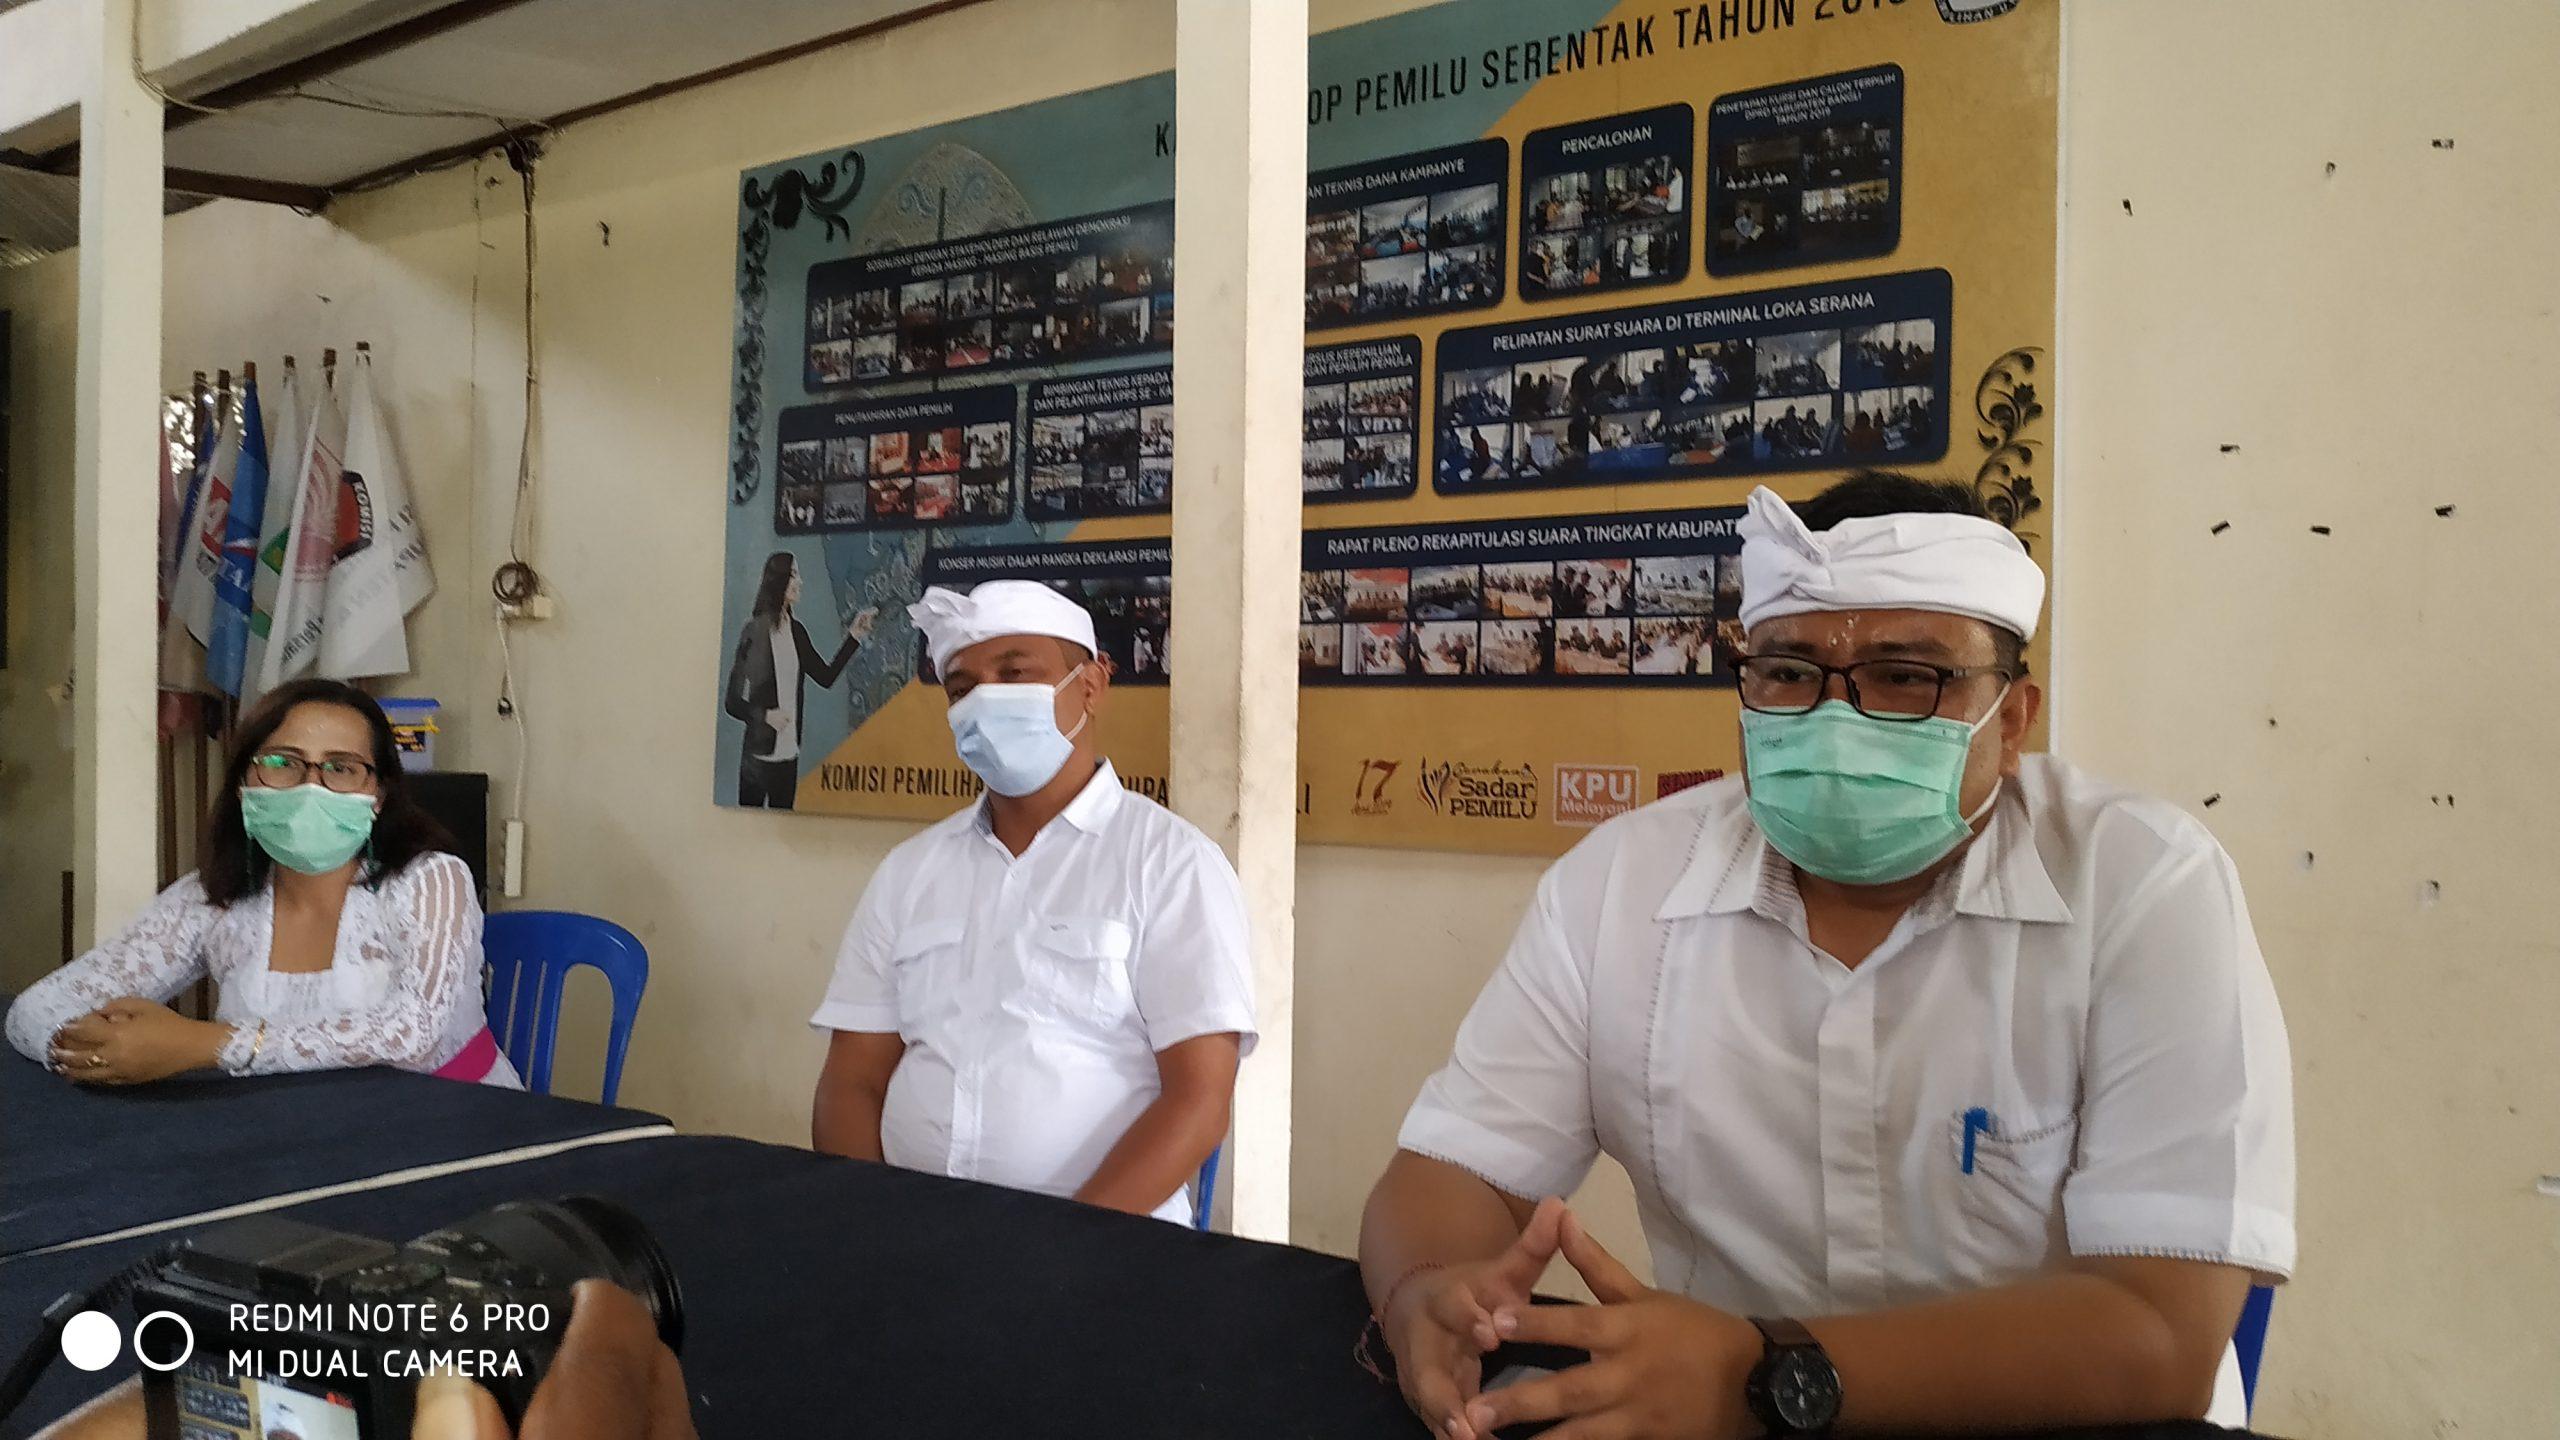 PLH Ketua KPU Bangli, I Gede Roy Suparman, didampingi dua komisioner saat memberikan keterangan pelaksanaan penetapan Bupati dan Wakil Bupati Bangli terpilih. Foto: ist